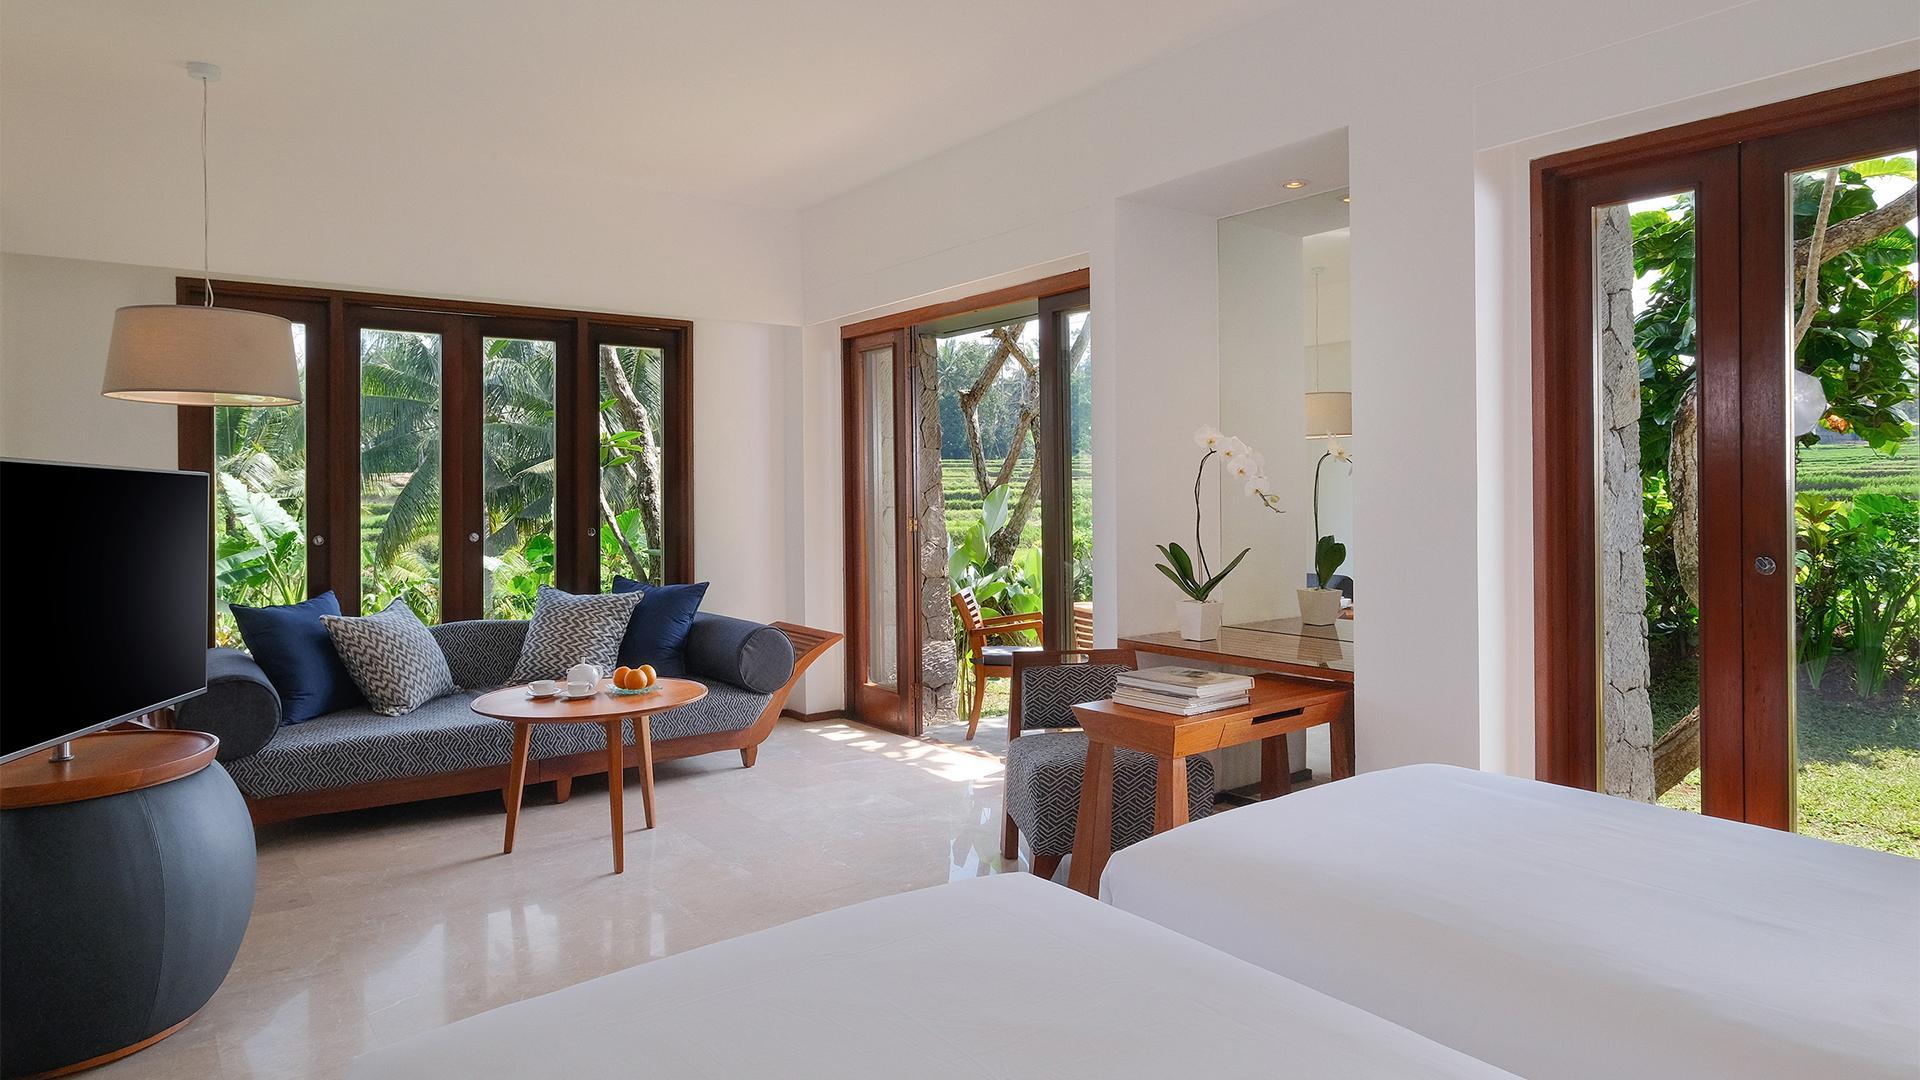 Impressive Forest Corner Suite image 1 at Maya Ubud Resort & Spa by Kabupaten Gianyar, Bali, Indonesia